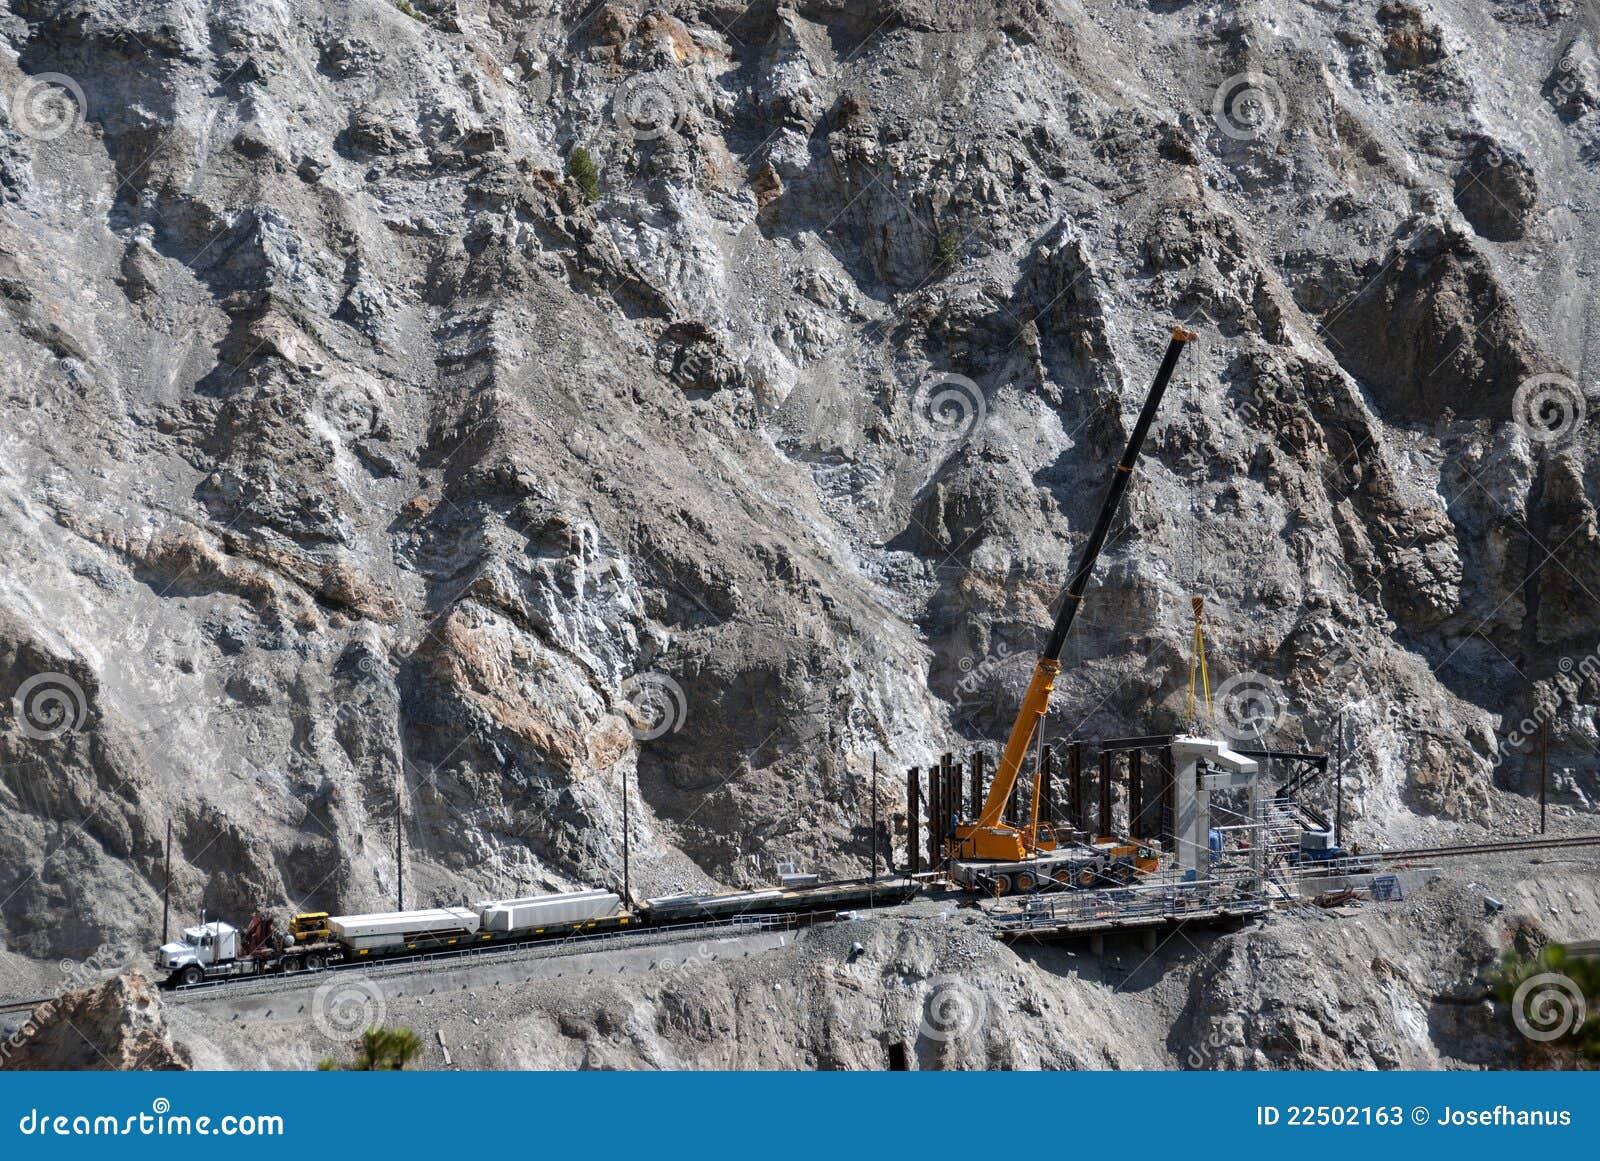 Rail construction in rocky terrain stock photos image for Construction terrain